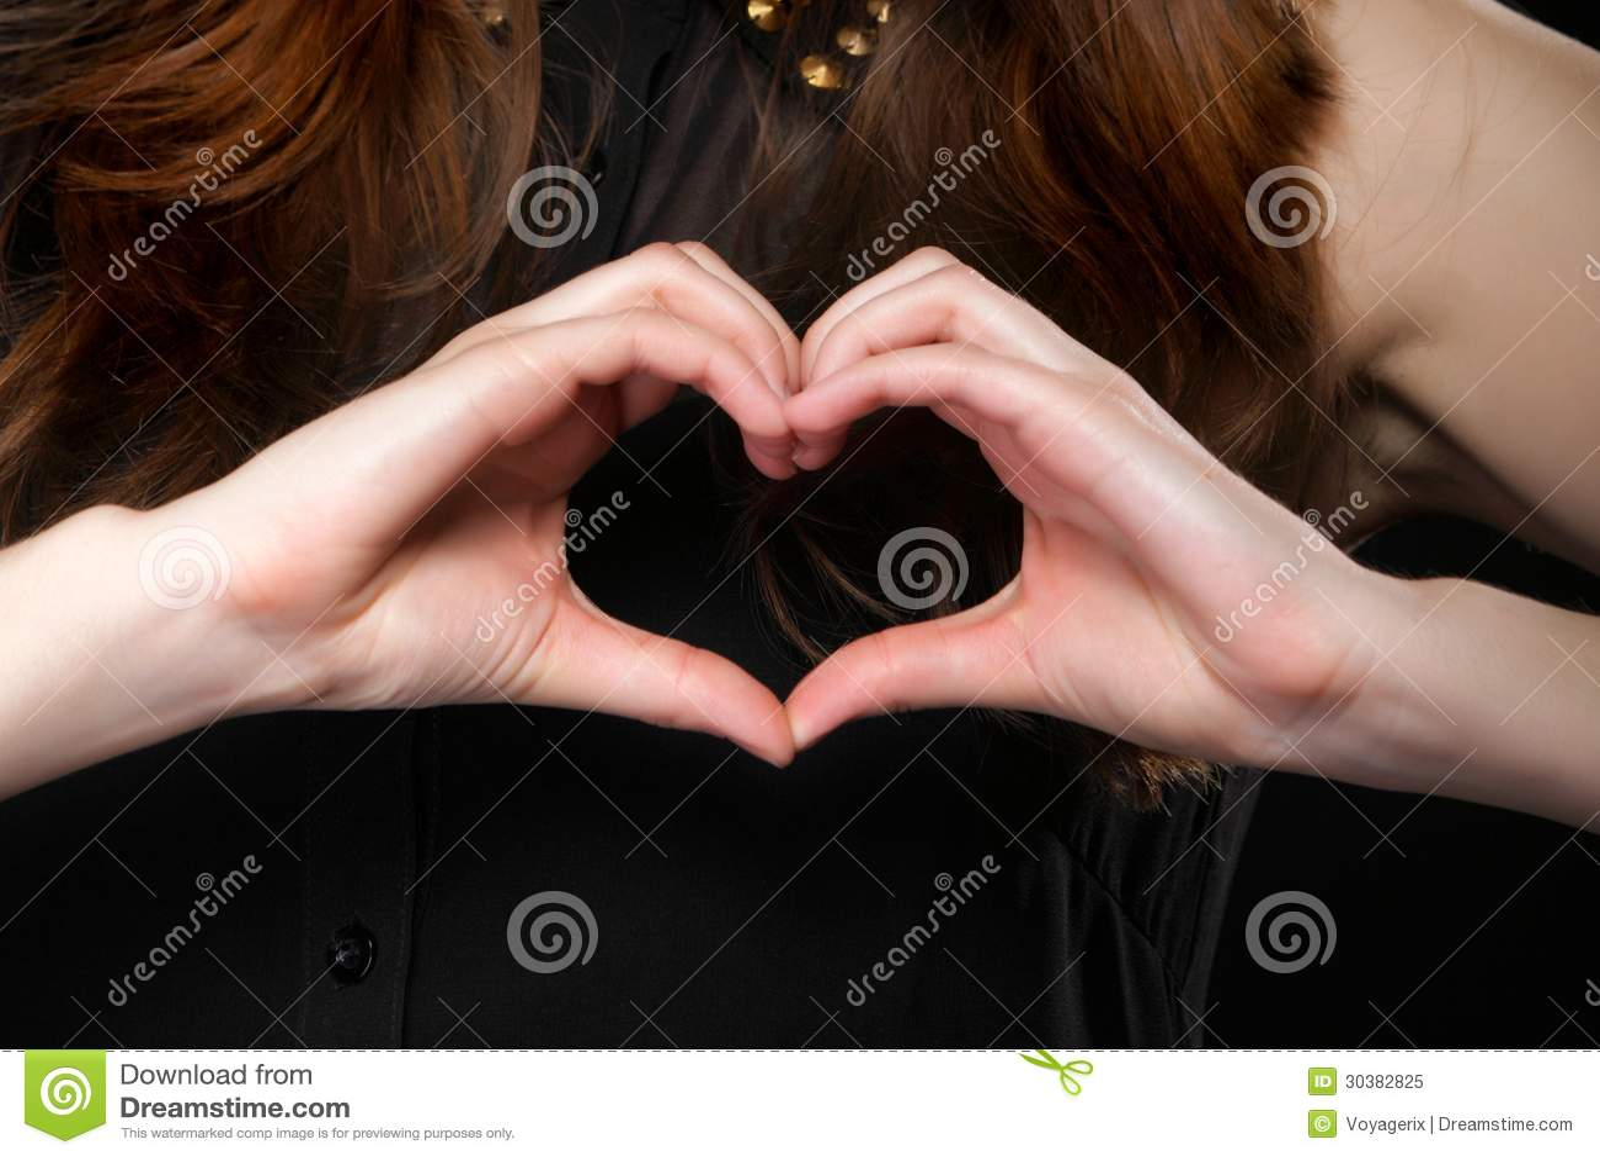 Girl Doing Heart Shape Love Symbol Her Hands Stock Images 36 Photos